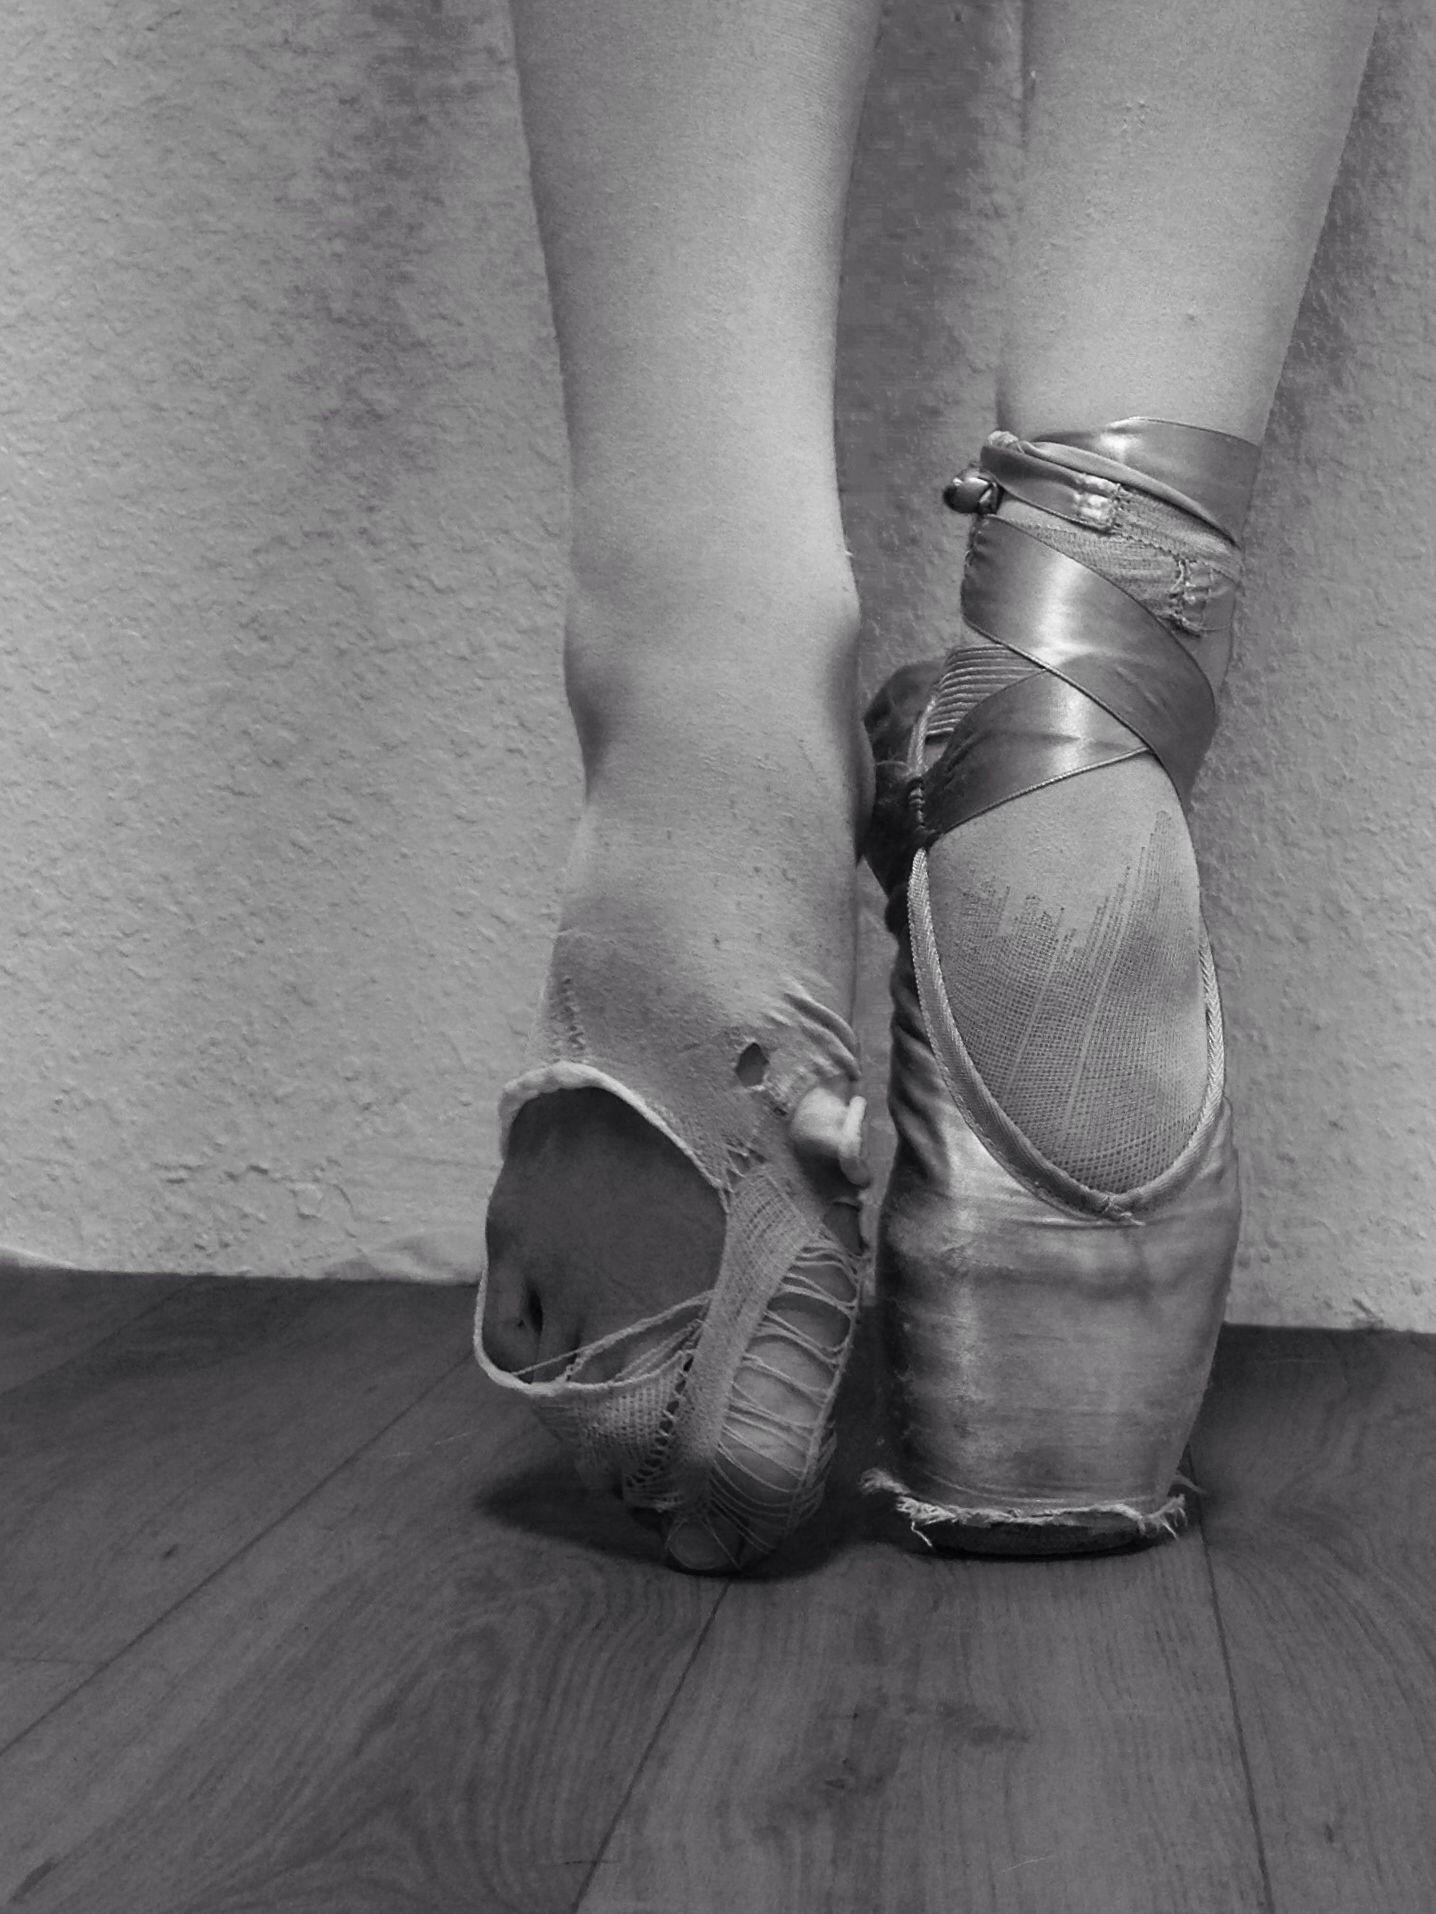 Ballet is hard work ballet ballet shoes sport shoes